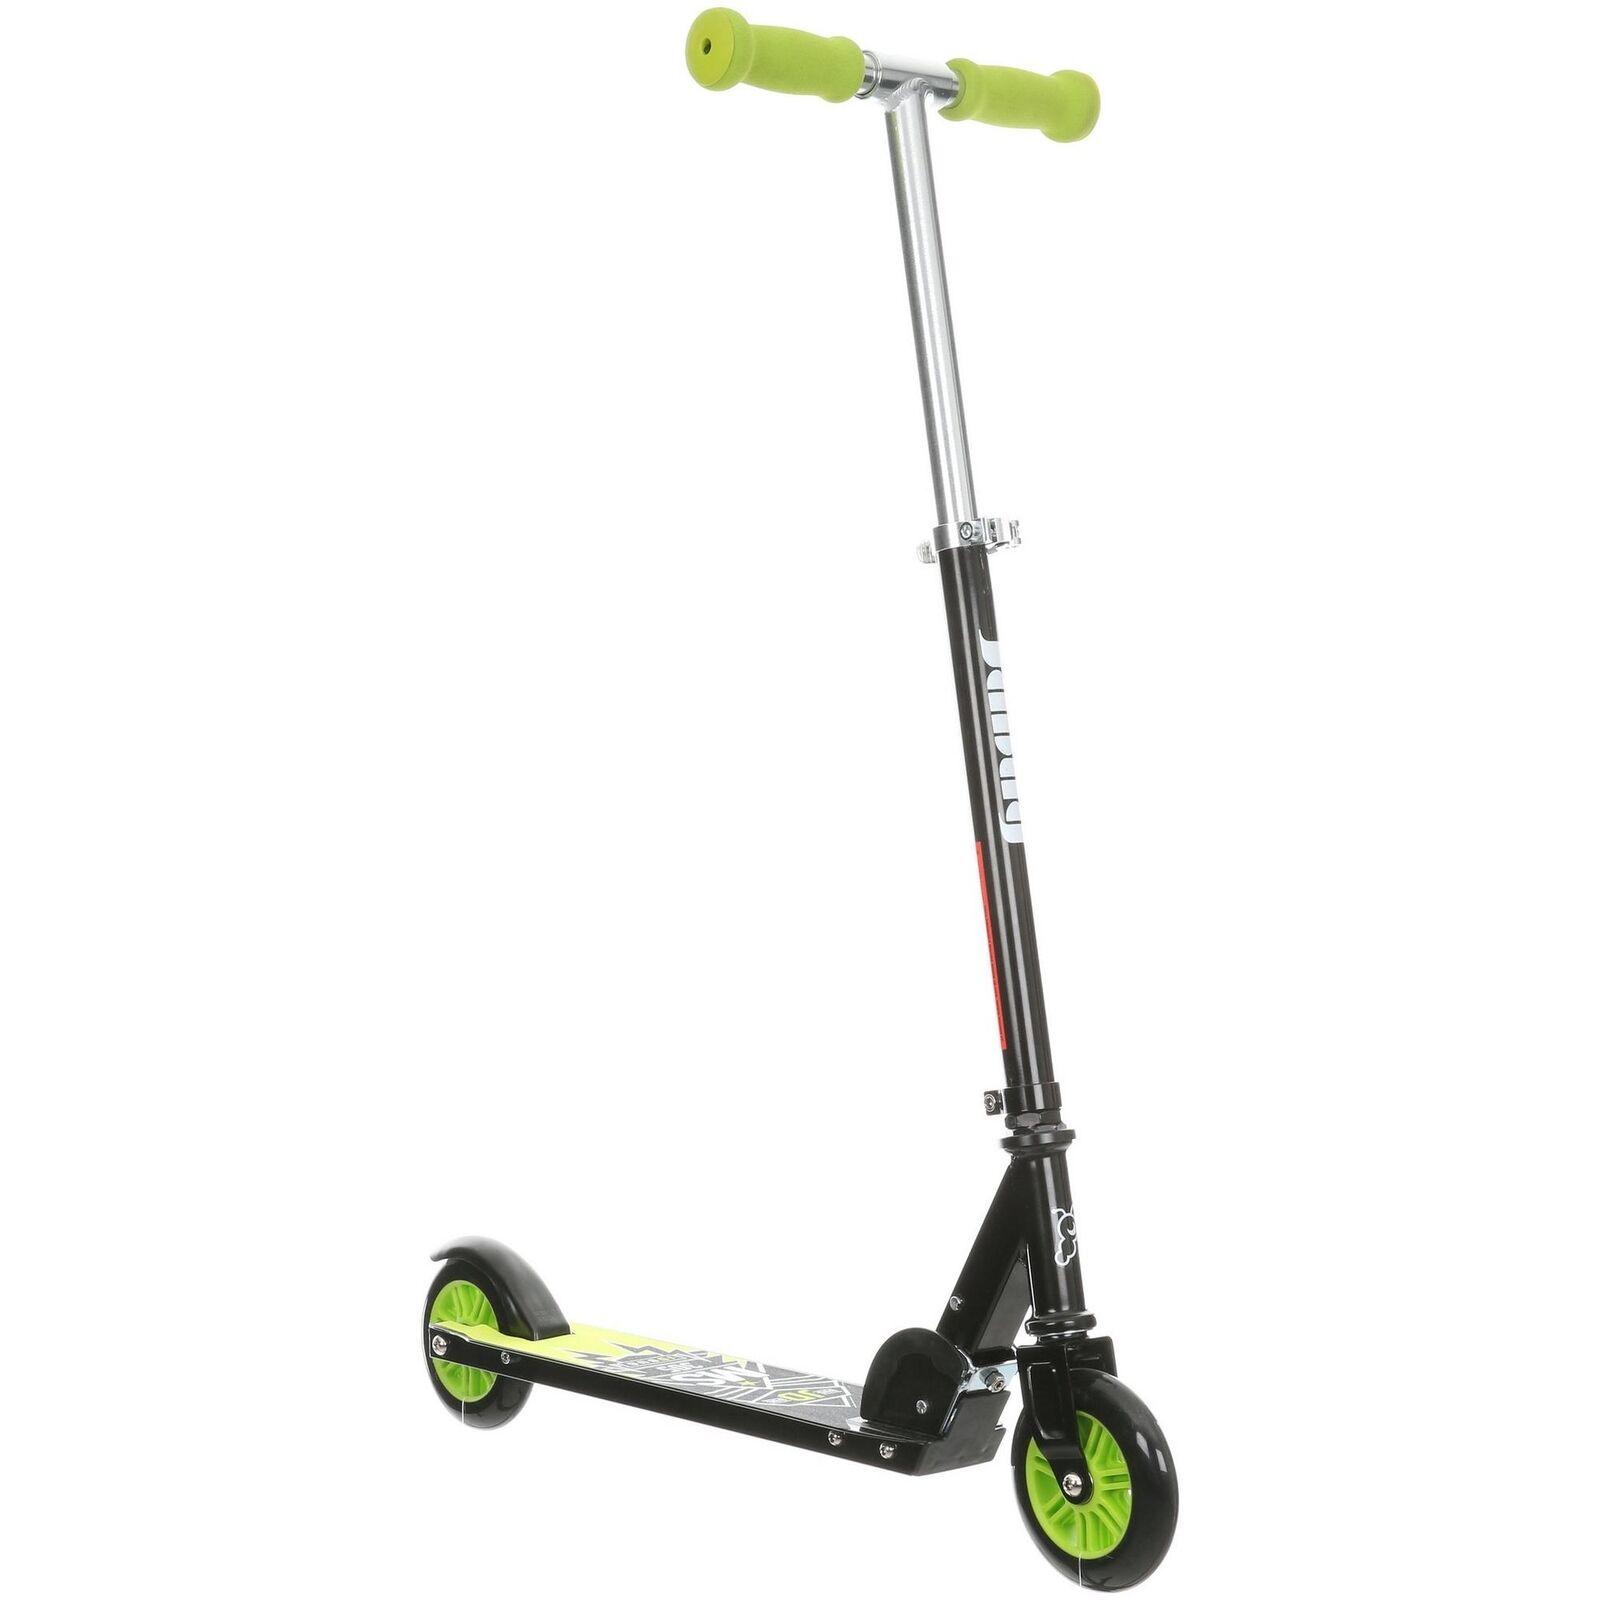 JD Bug Classic 4 Scooter 2017 Aluminium Frame Kids Ride Foldable 2 Wheels